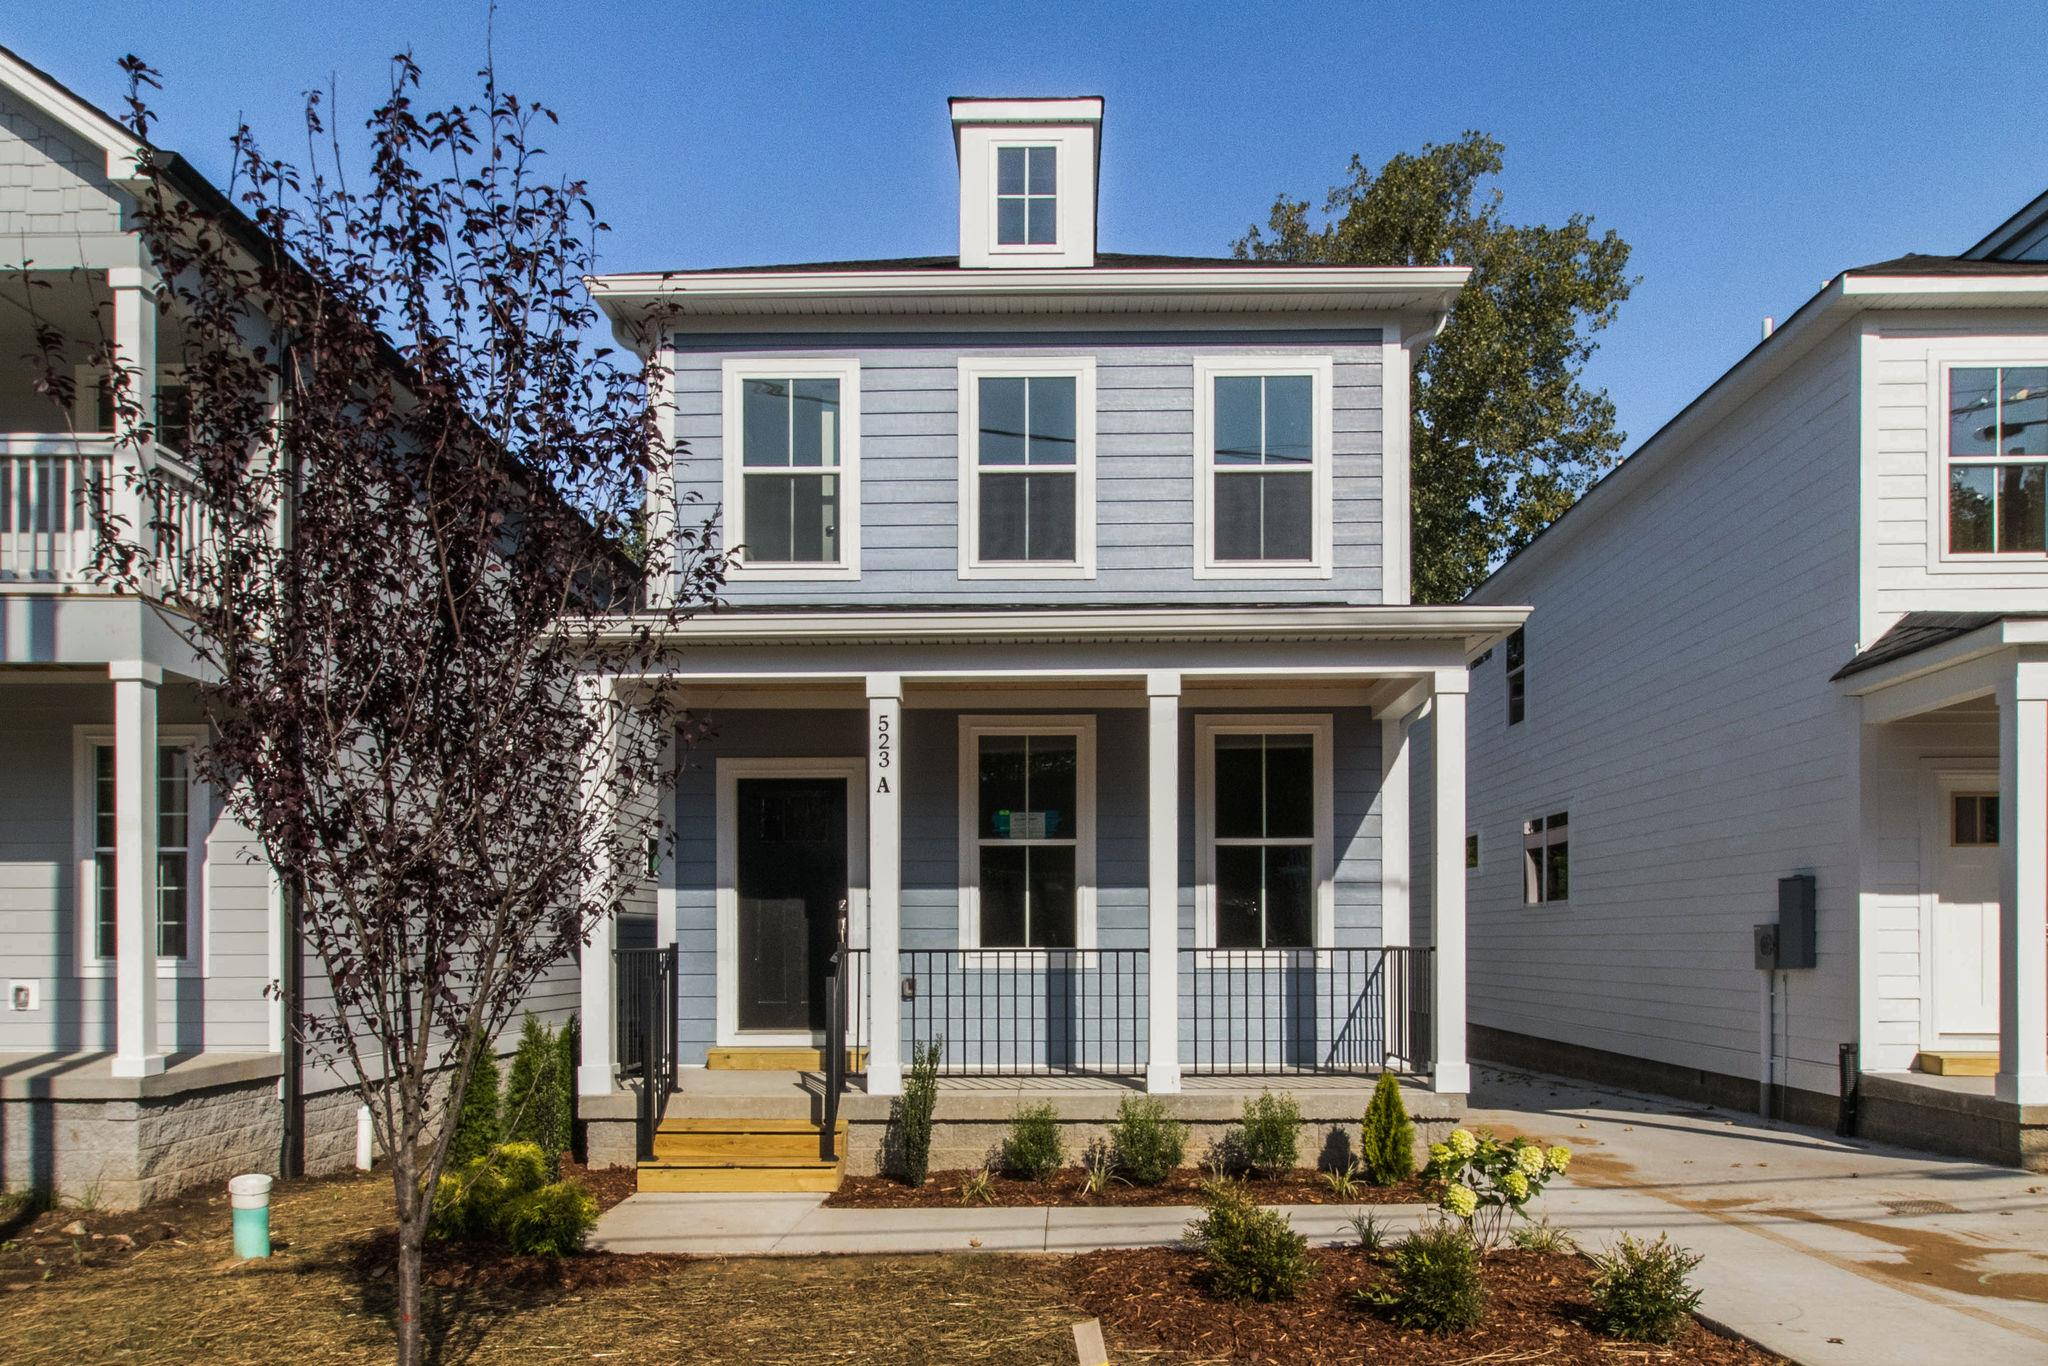 523A Basswood Ave, Nashville, TN 37209 - Nashville, TN real estate listing